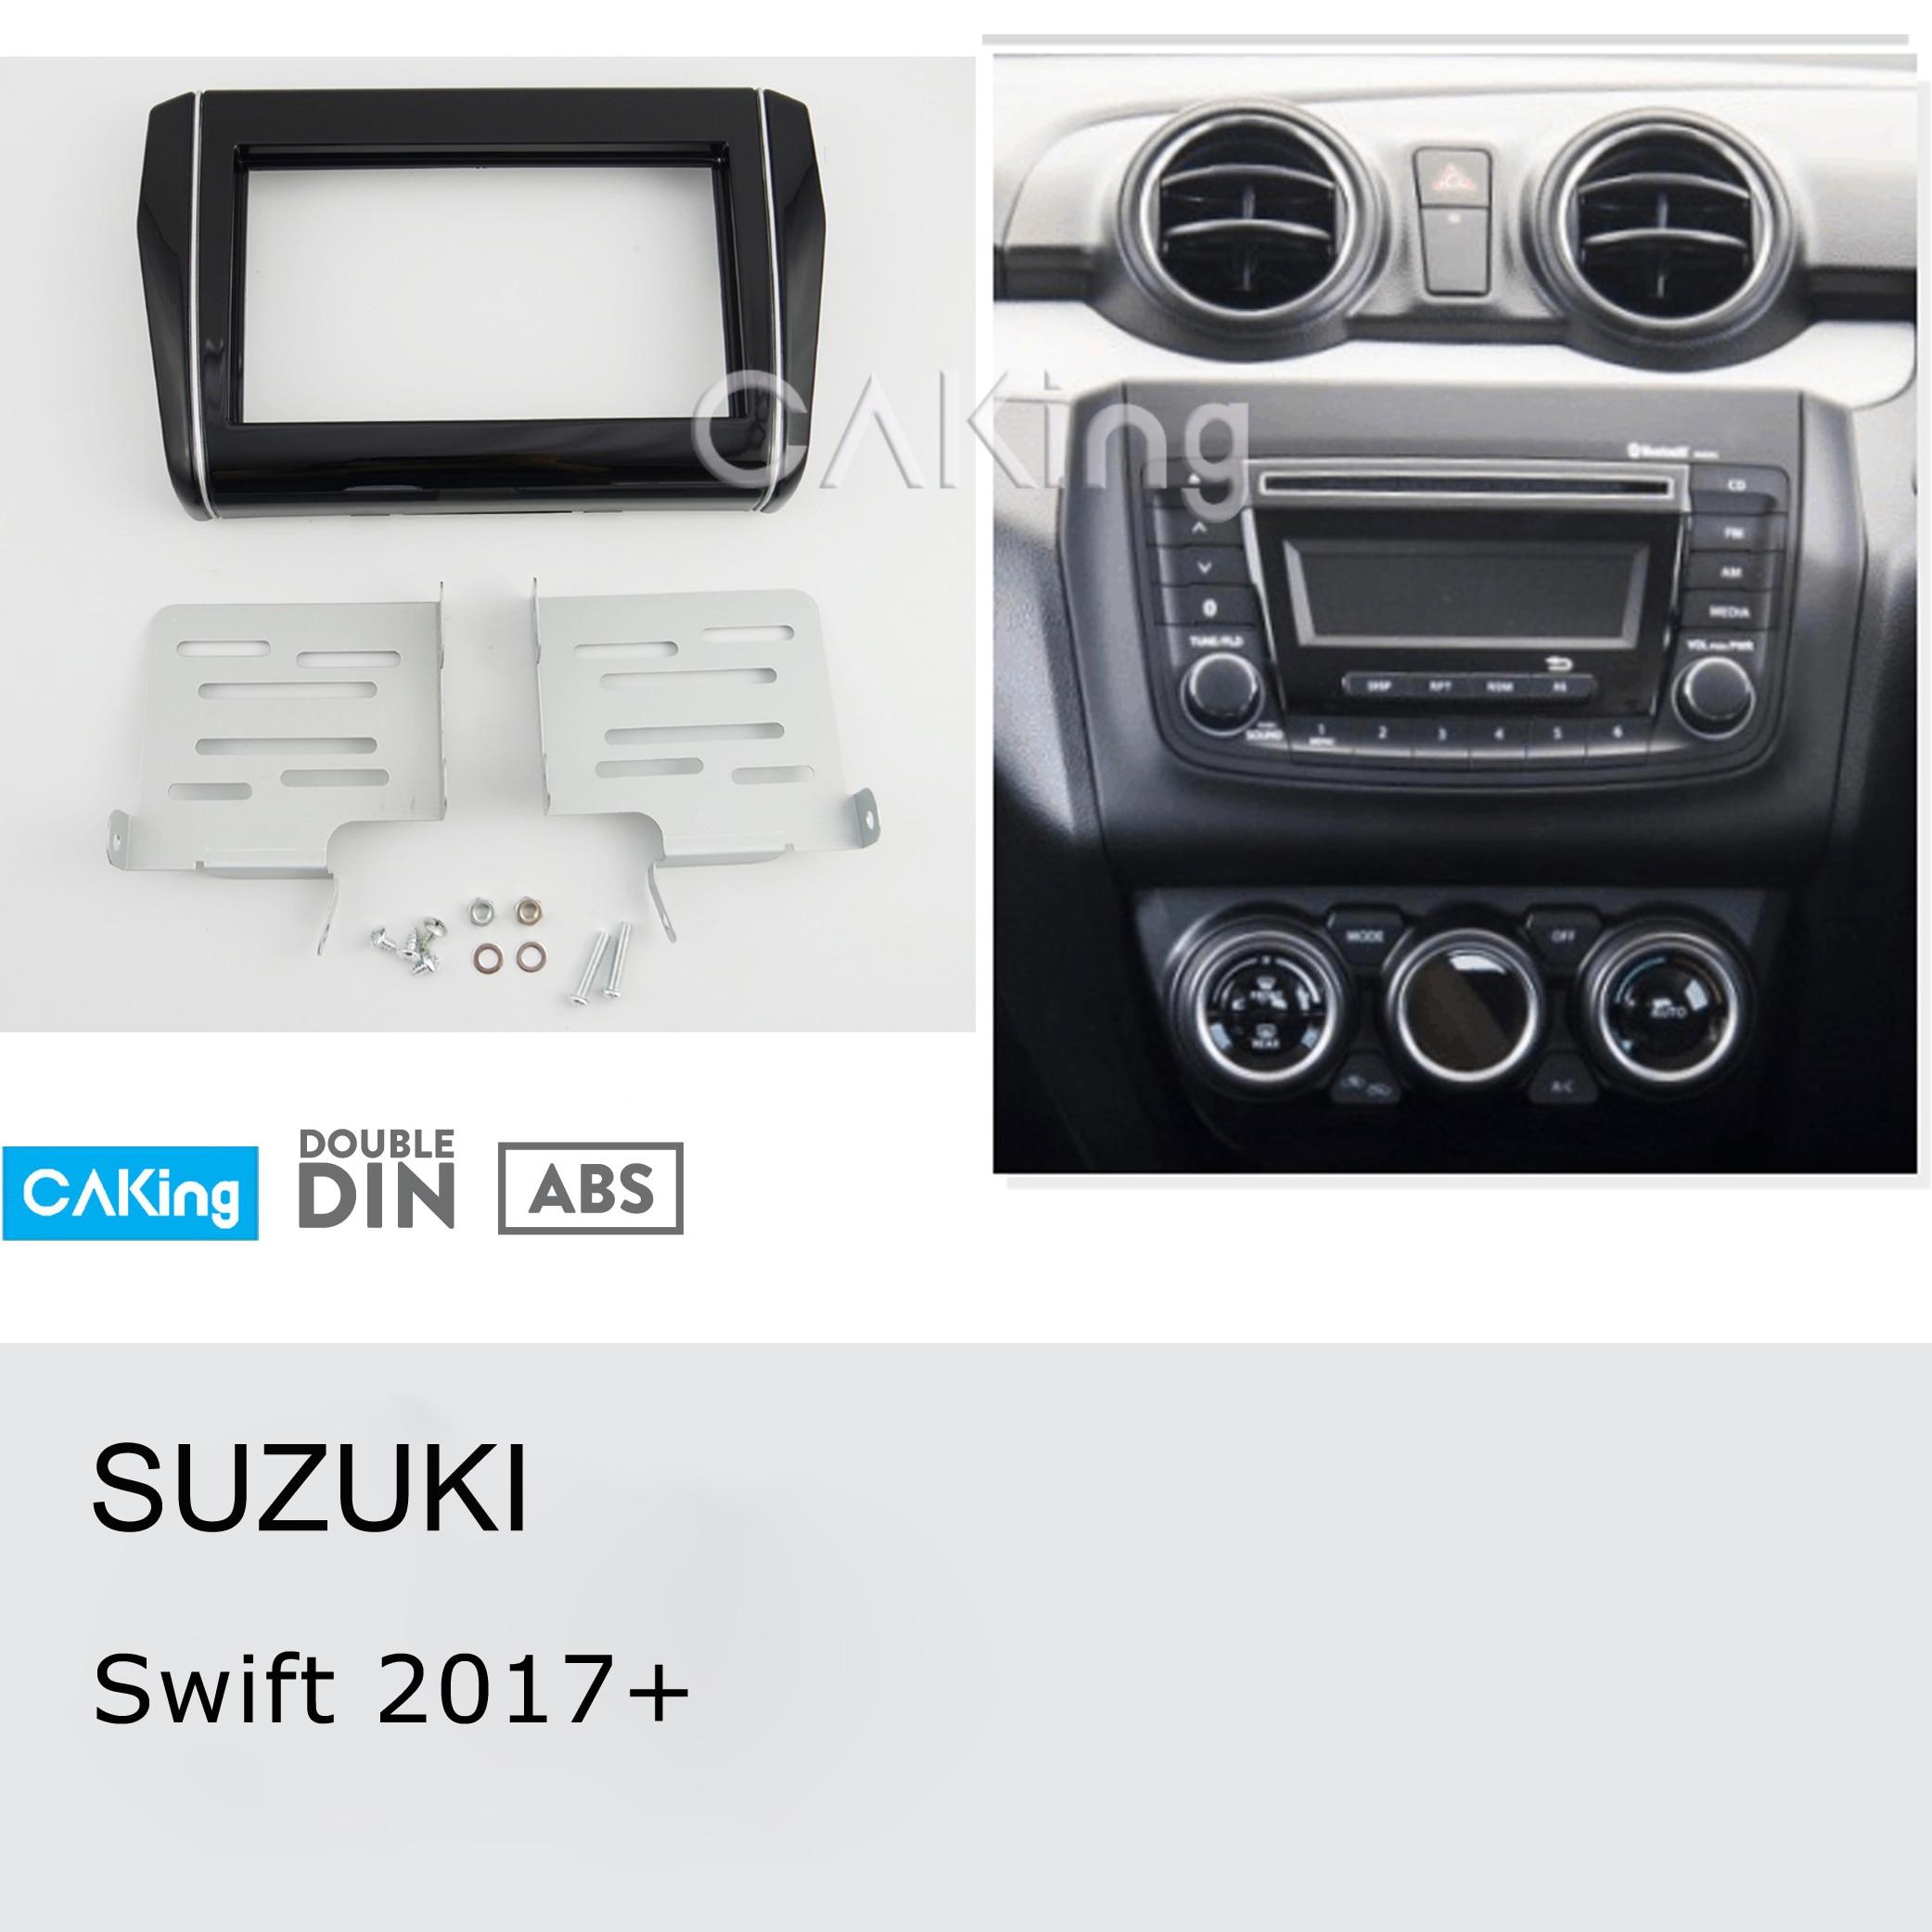 Double Din Car Fascia Radio Panel for SUZUKI Swift 2017 Console Dash Fitting Kit Install Facia